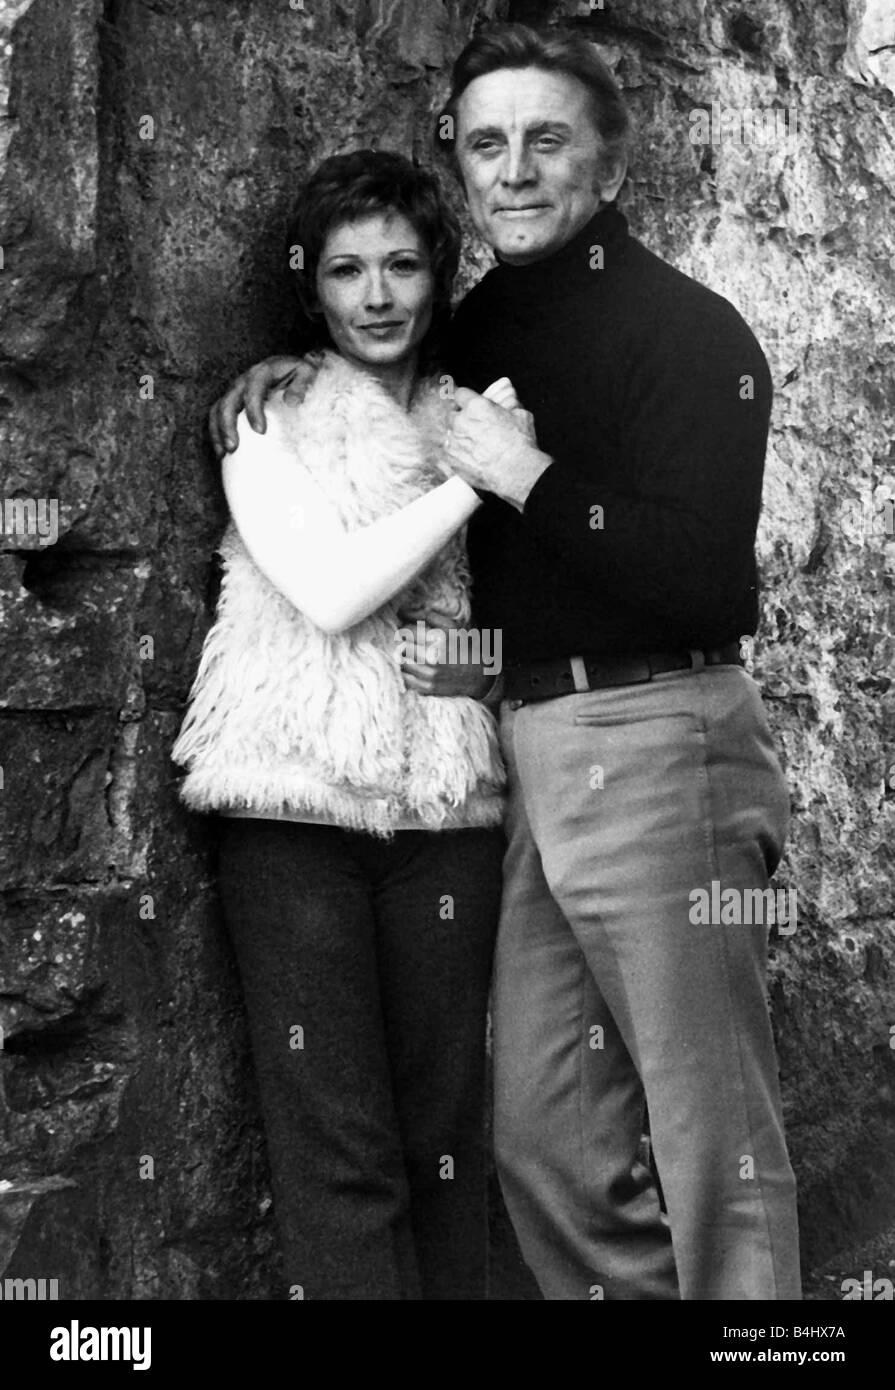 Kirk Douglas And Marlene Joubert In Oban 1971 Filming Catch